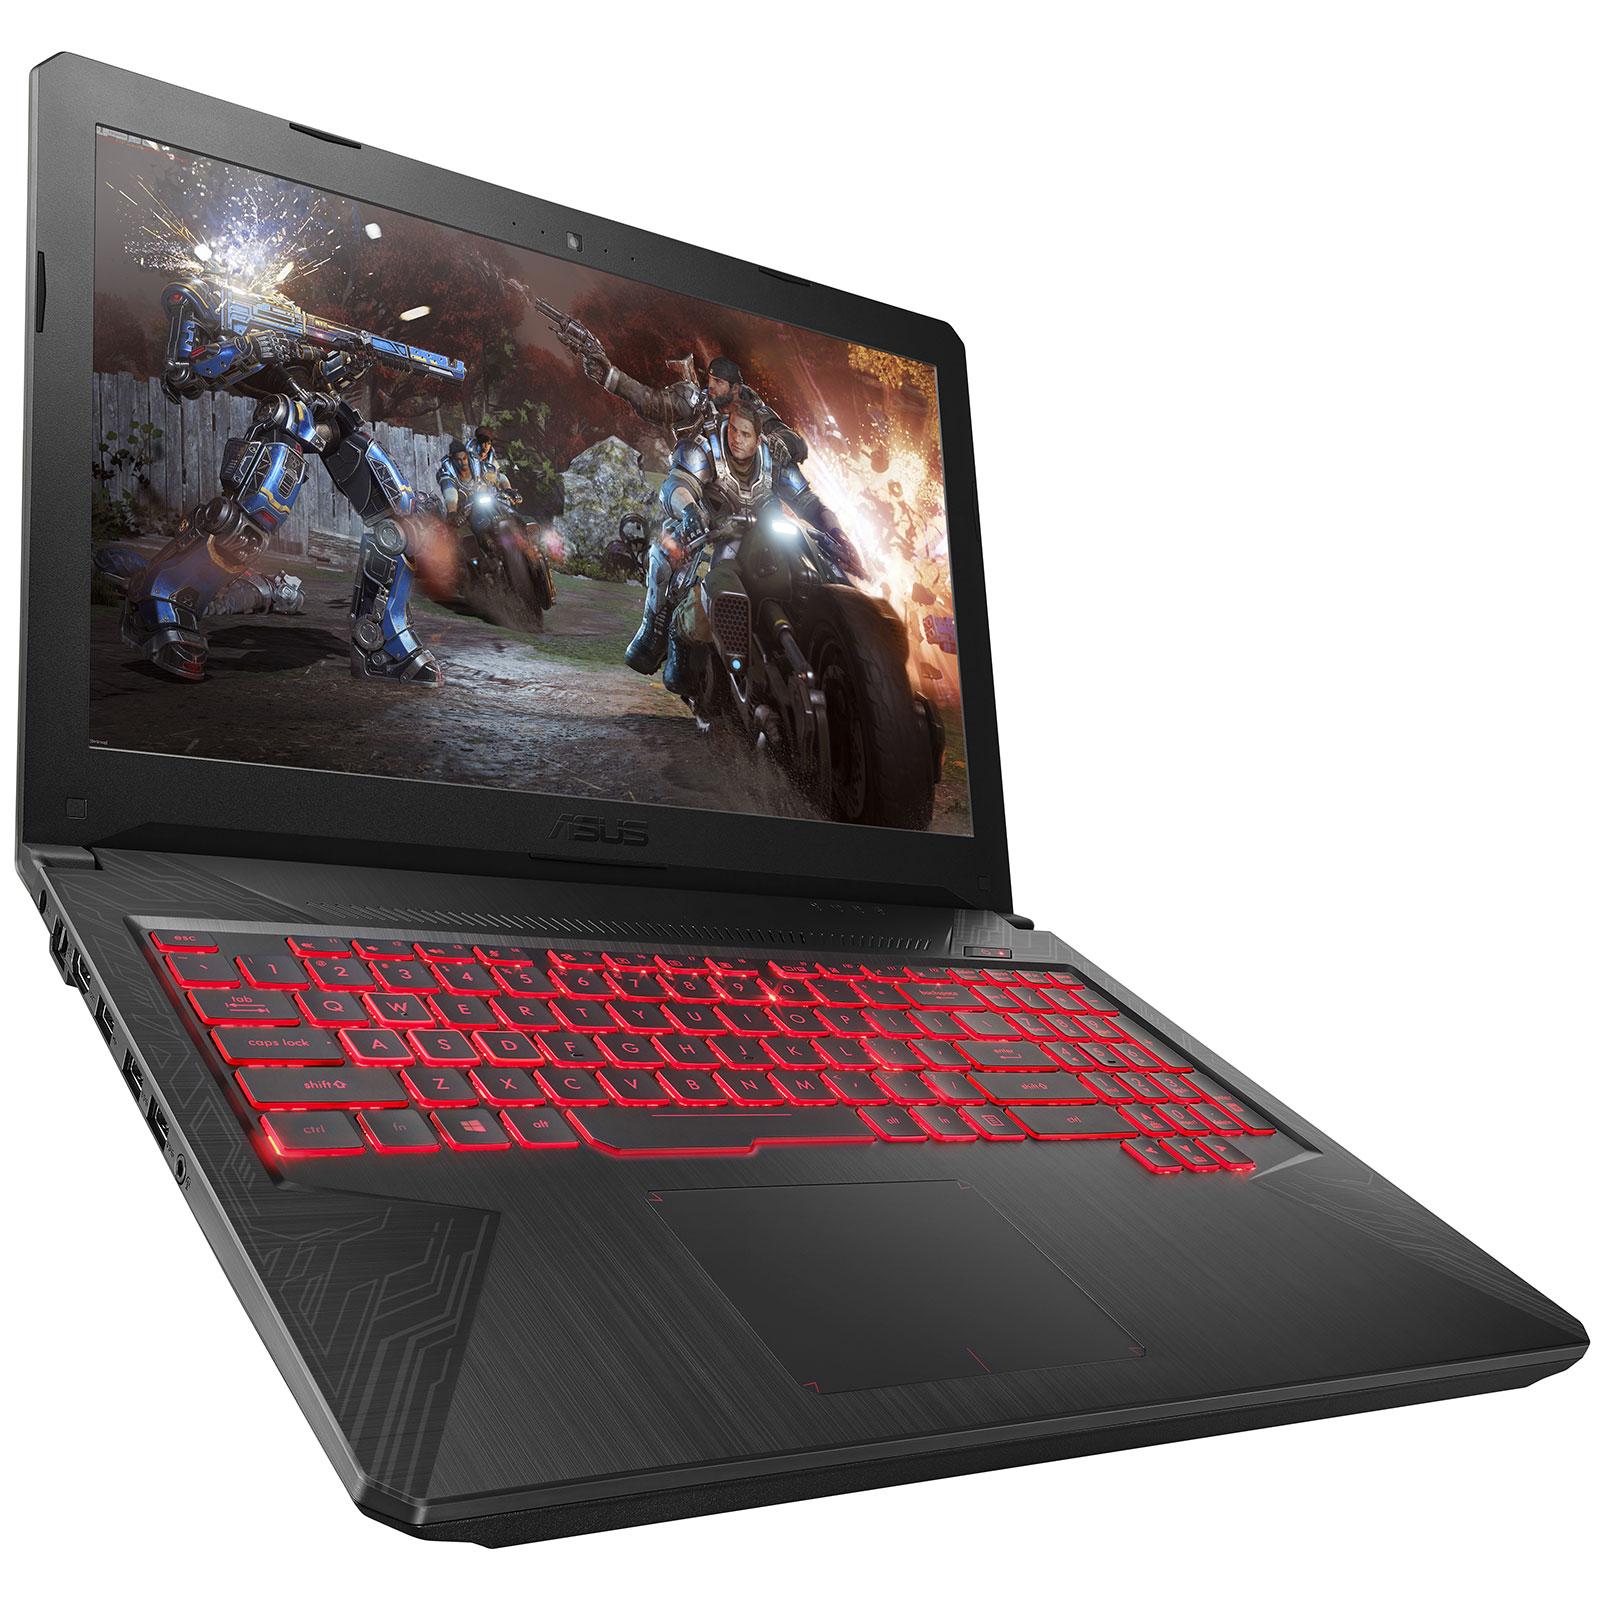 "PC portable ASUS TUF504GD-DM912 Intel Core i5-8300H 8 Go SSHD 1 To 15.6"" LED Full HD NVIDIA GeForce GTX 1050 2 Go Wi-Fi AC/Bluetooth Webcam Sans OS (garantie constructeur 2 ans)"